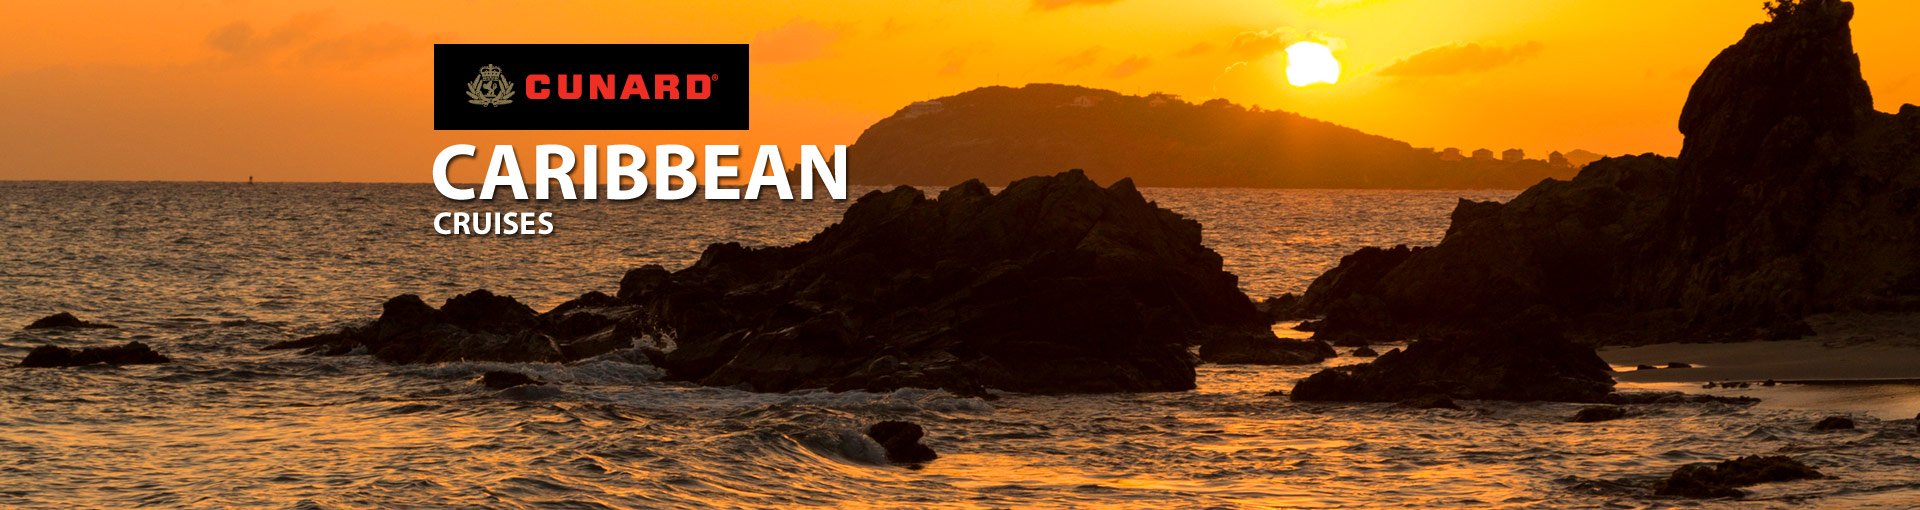 Cunard Line Caribbean Cruises